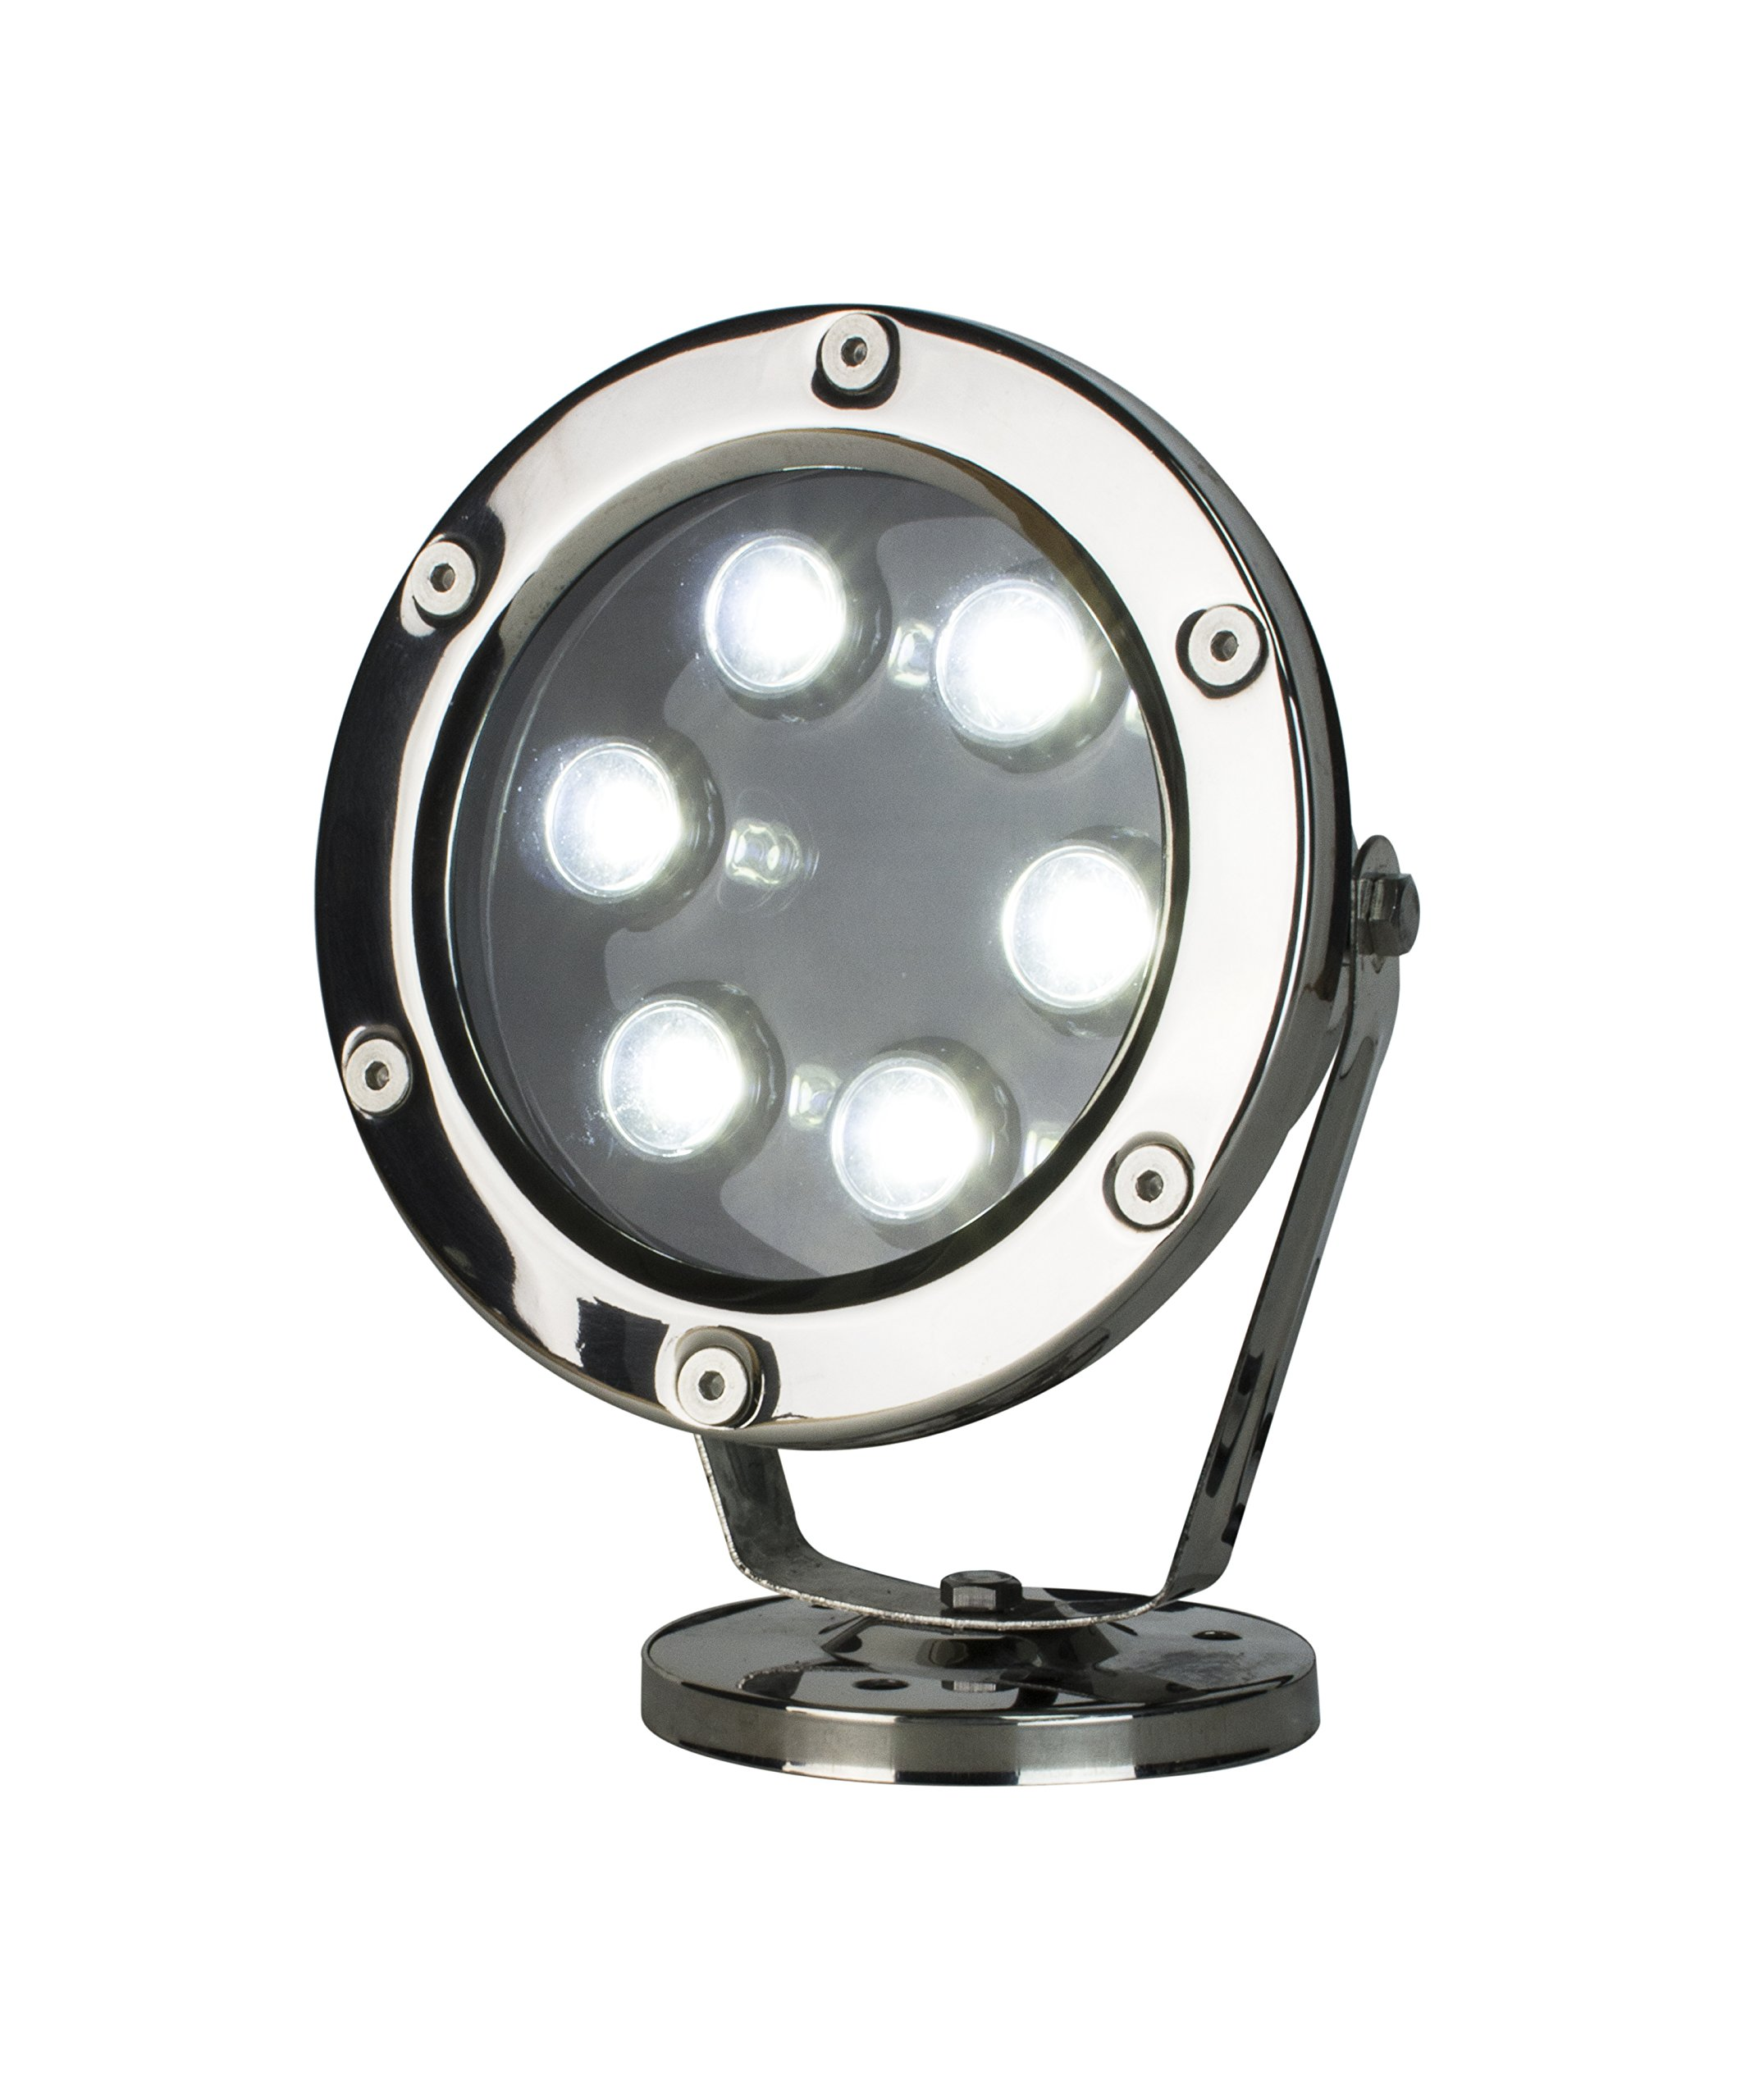 Lifegard R441001 Submersible Pond and Fountain LED Light, White